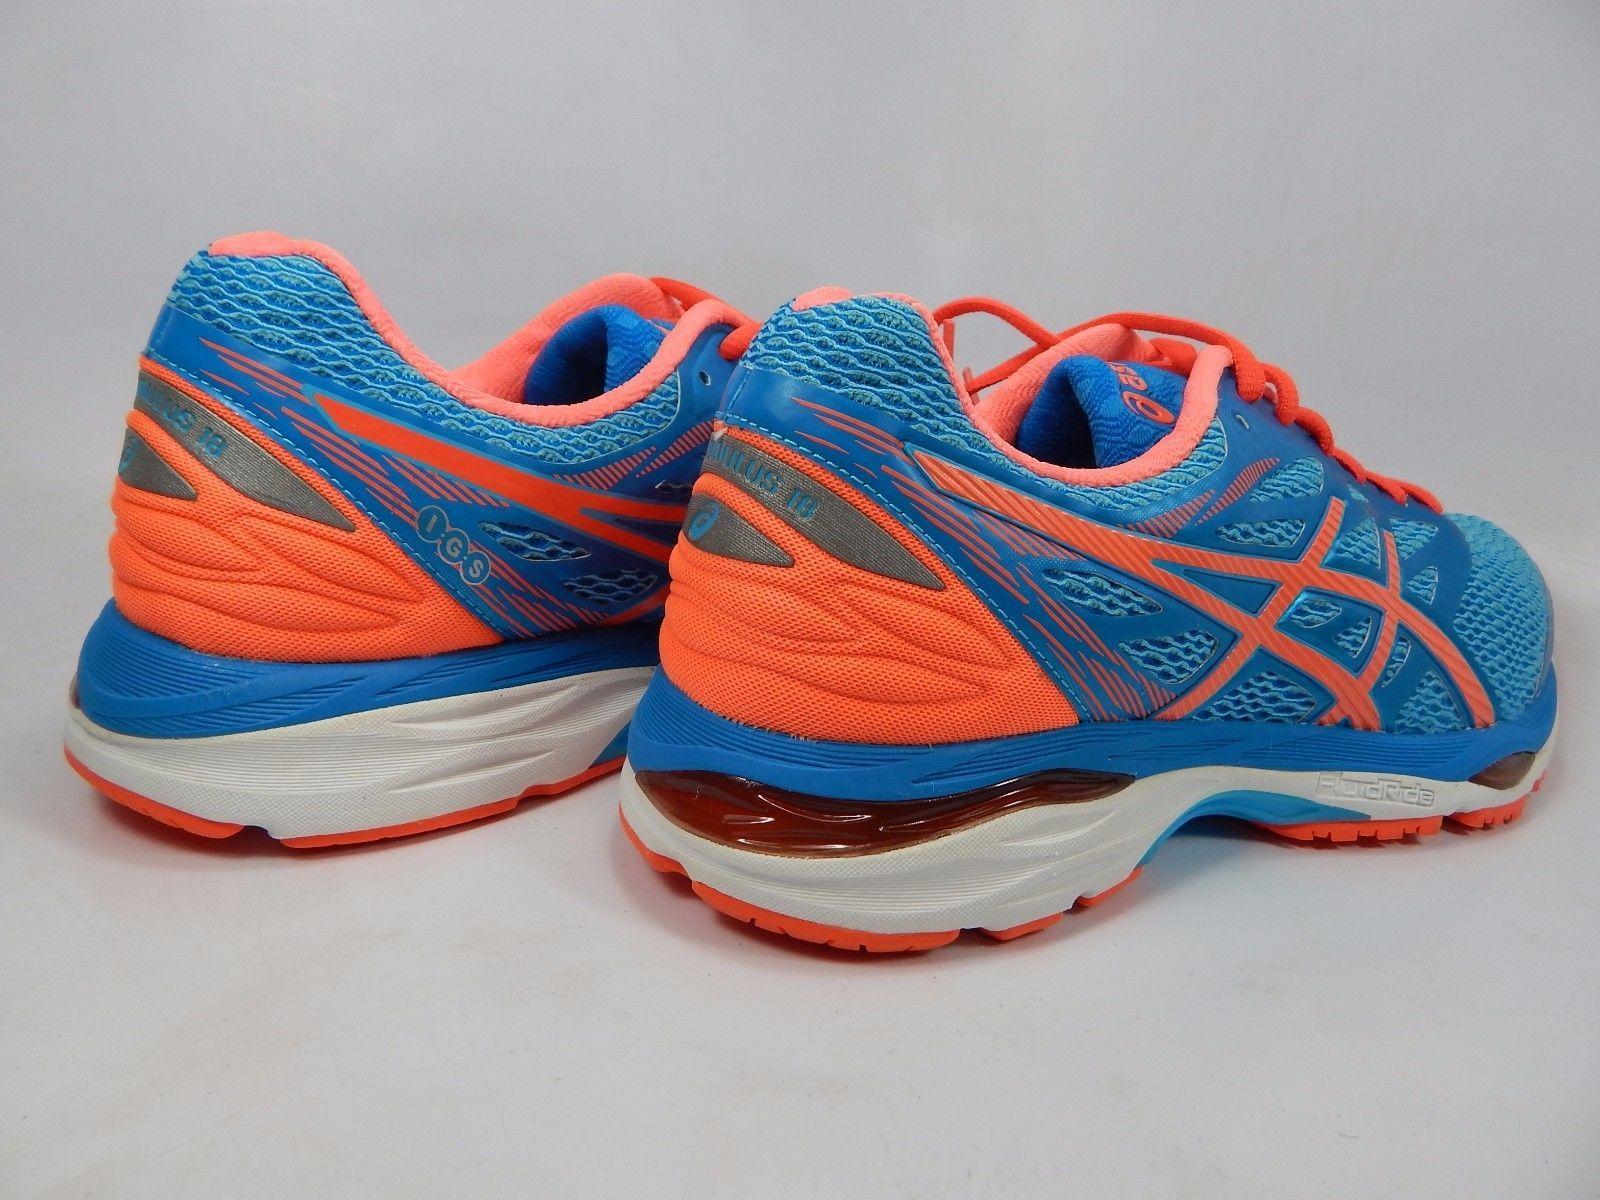 Asics Gel Cumulus 18 Women's Running Shoes Size US 10 D WIDE EU 42 Blue T6C9N(D)